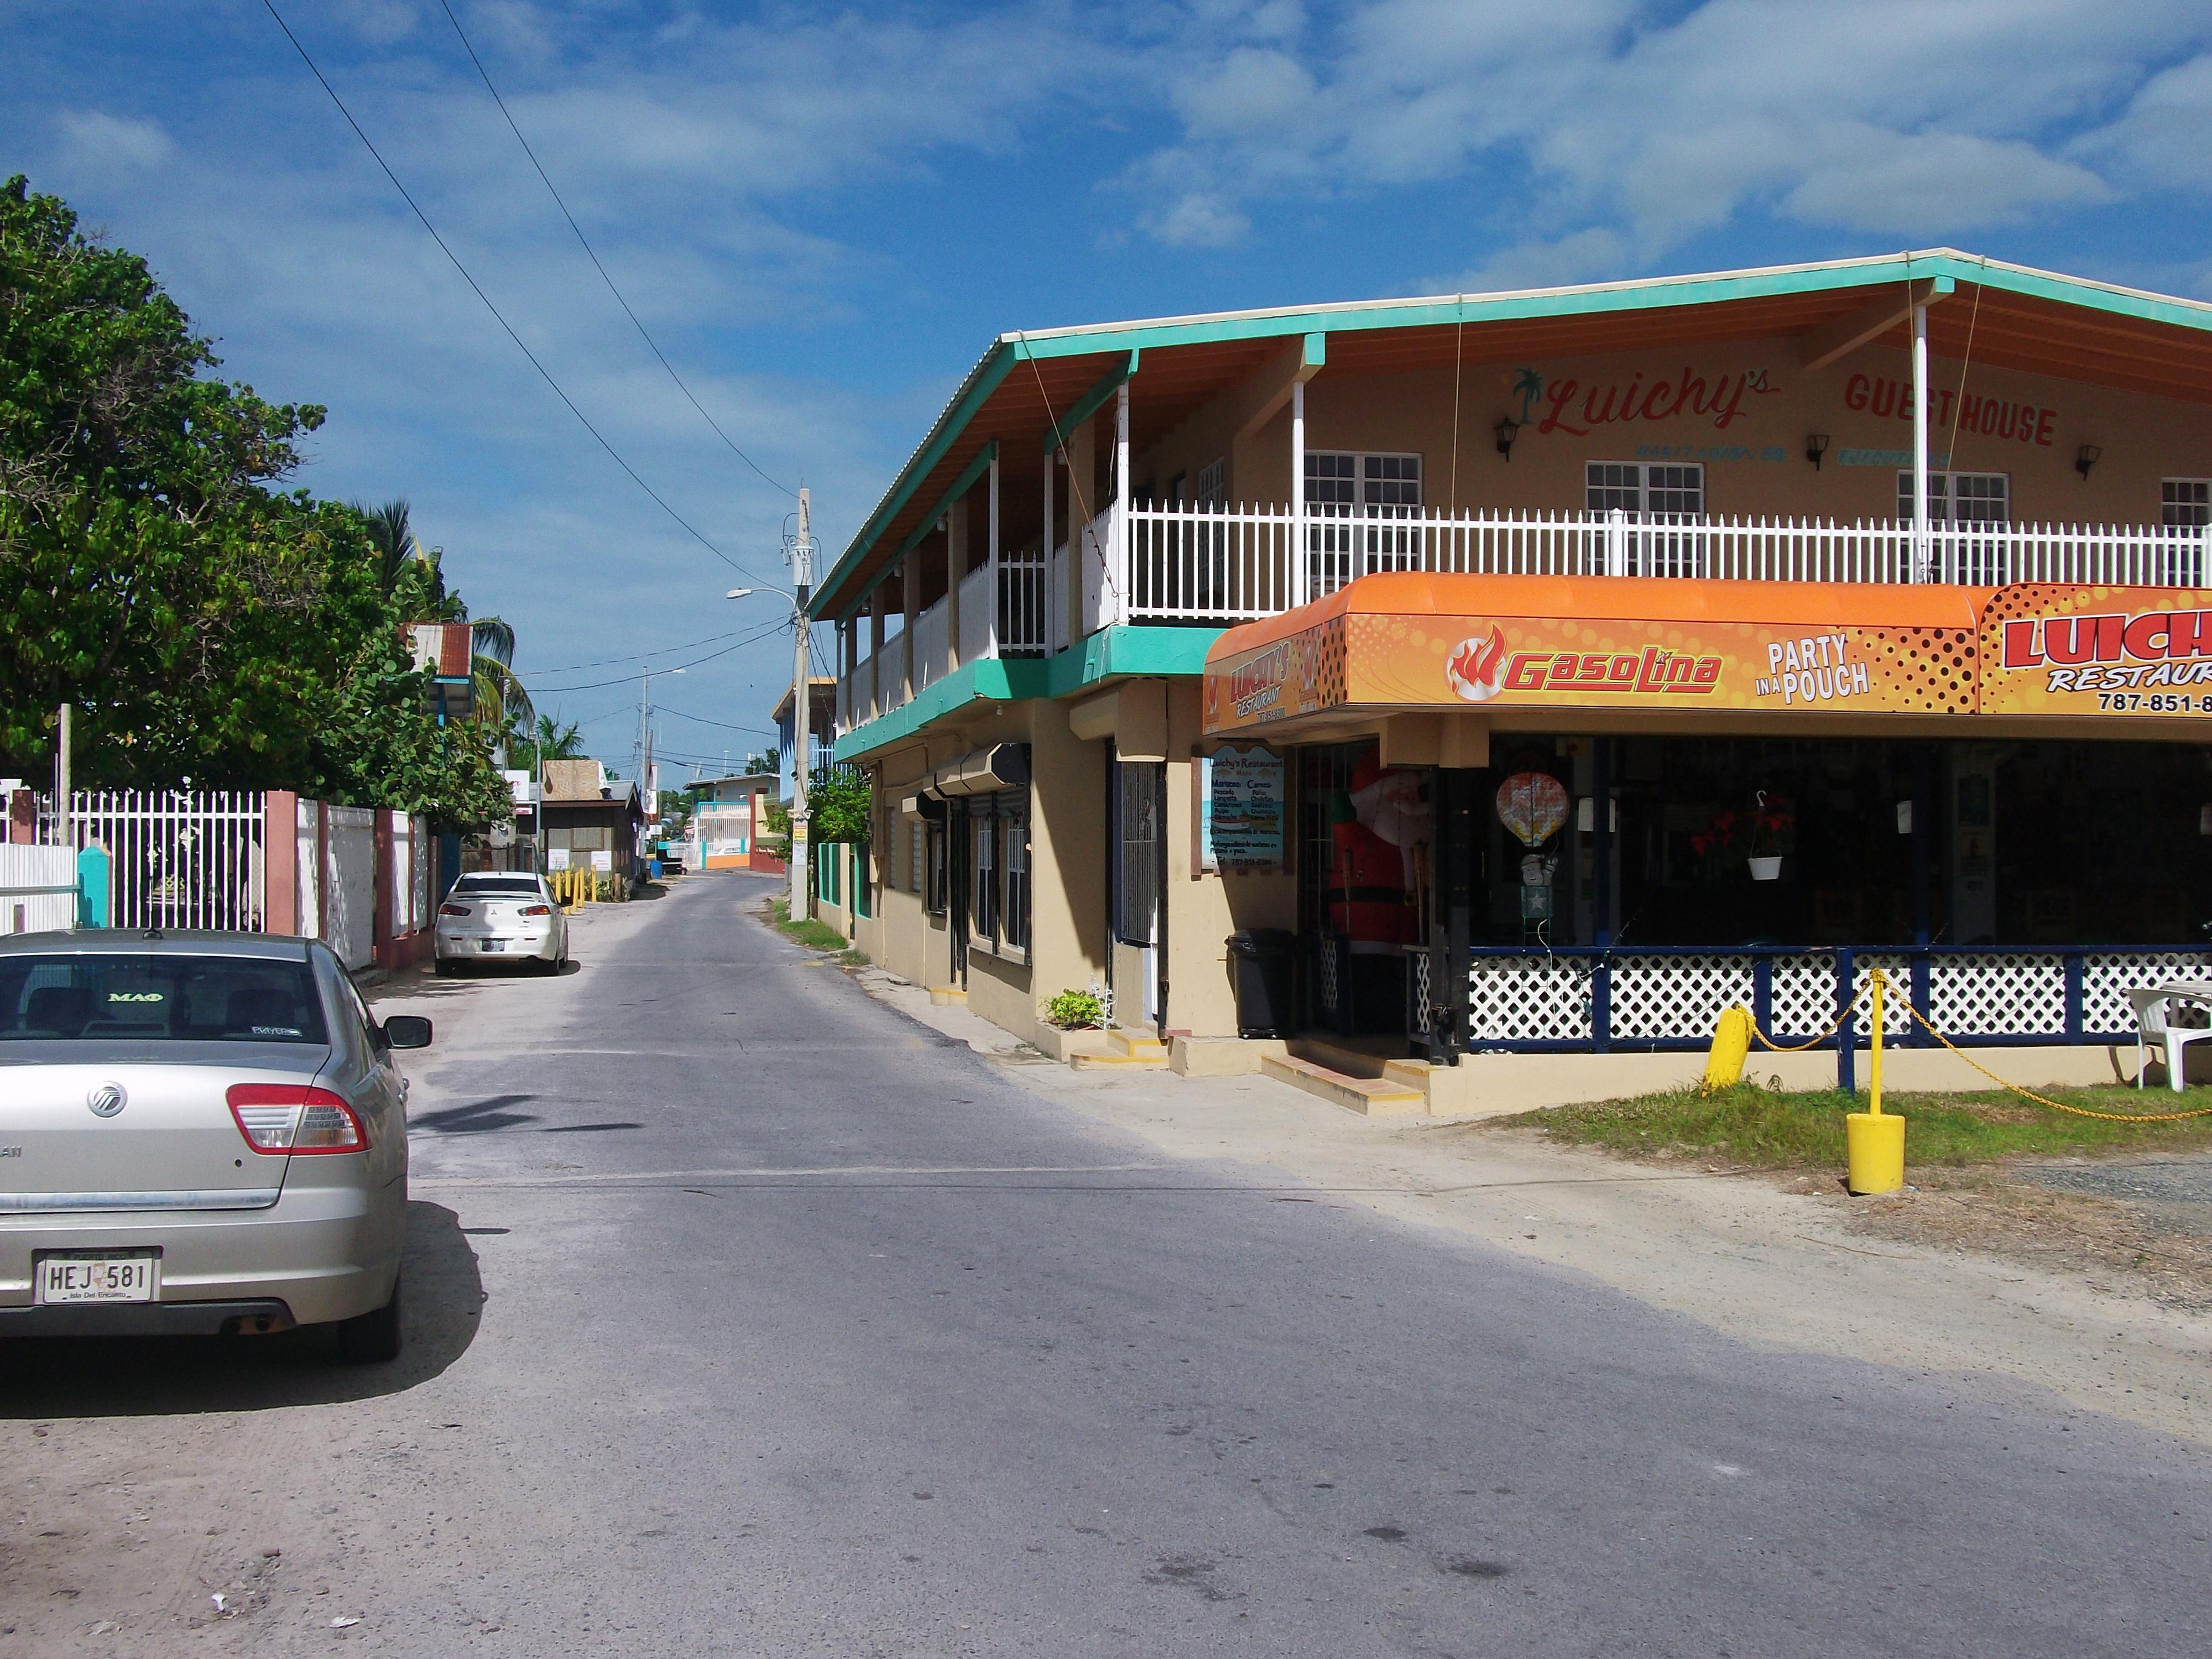 File poblado el combate cabo wikimedia commons for Villas koralina combate cabo rojo